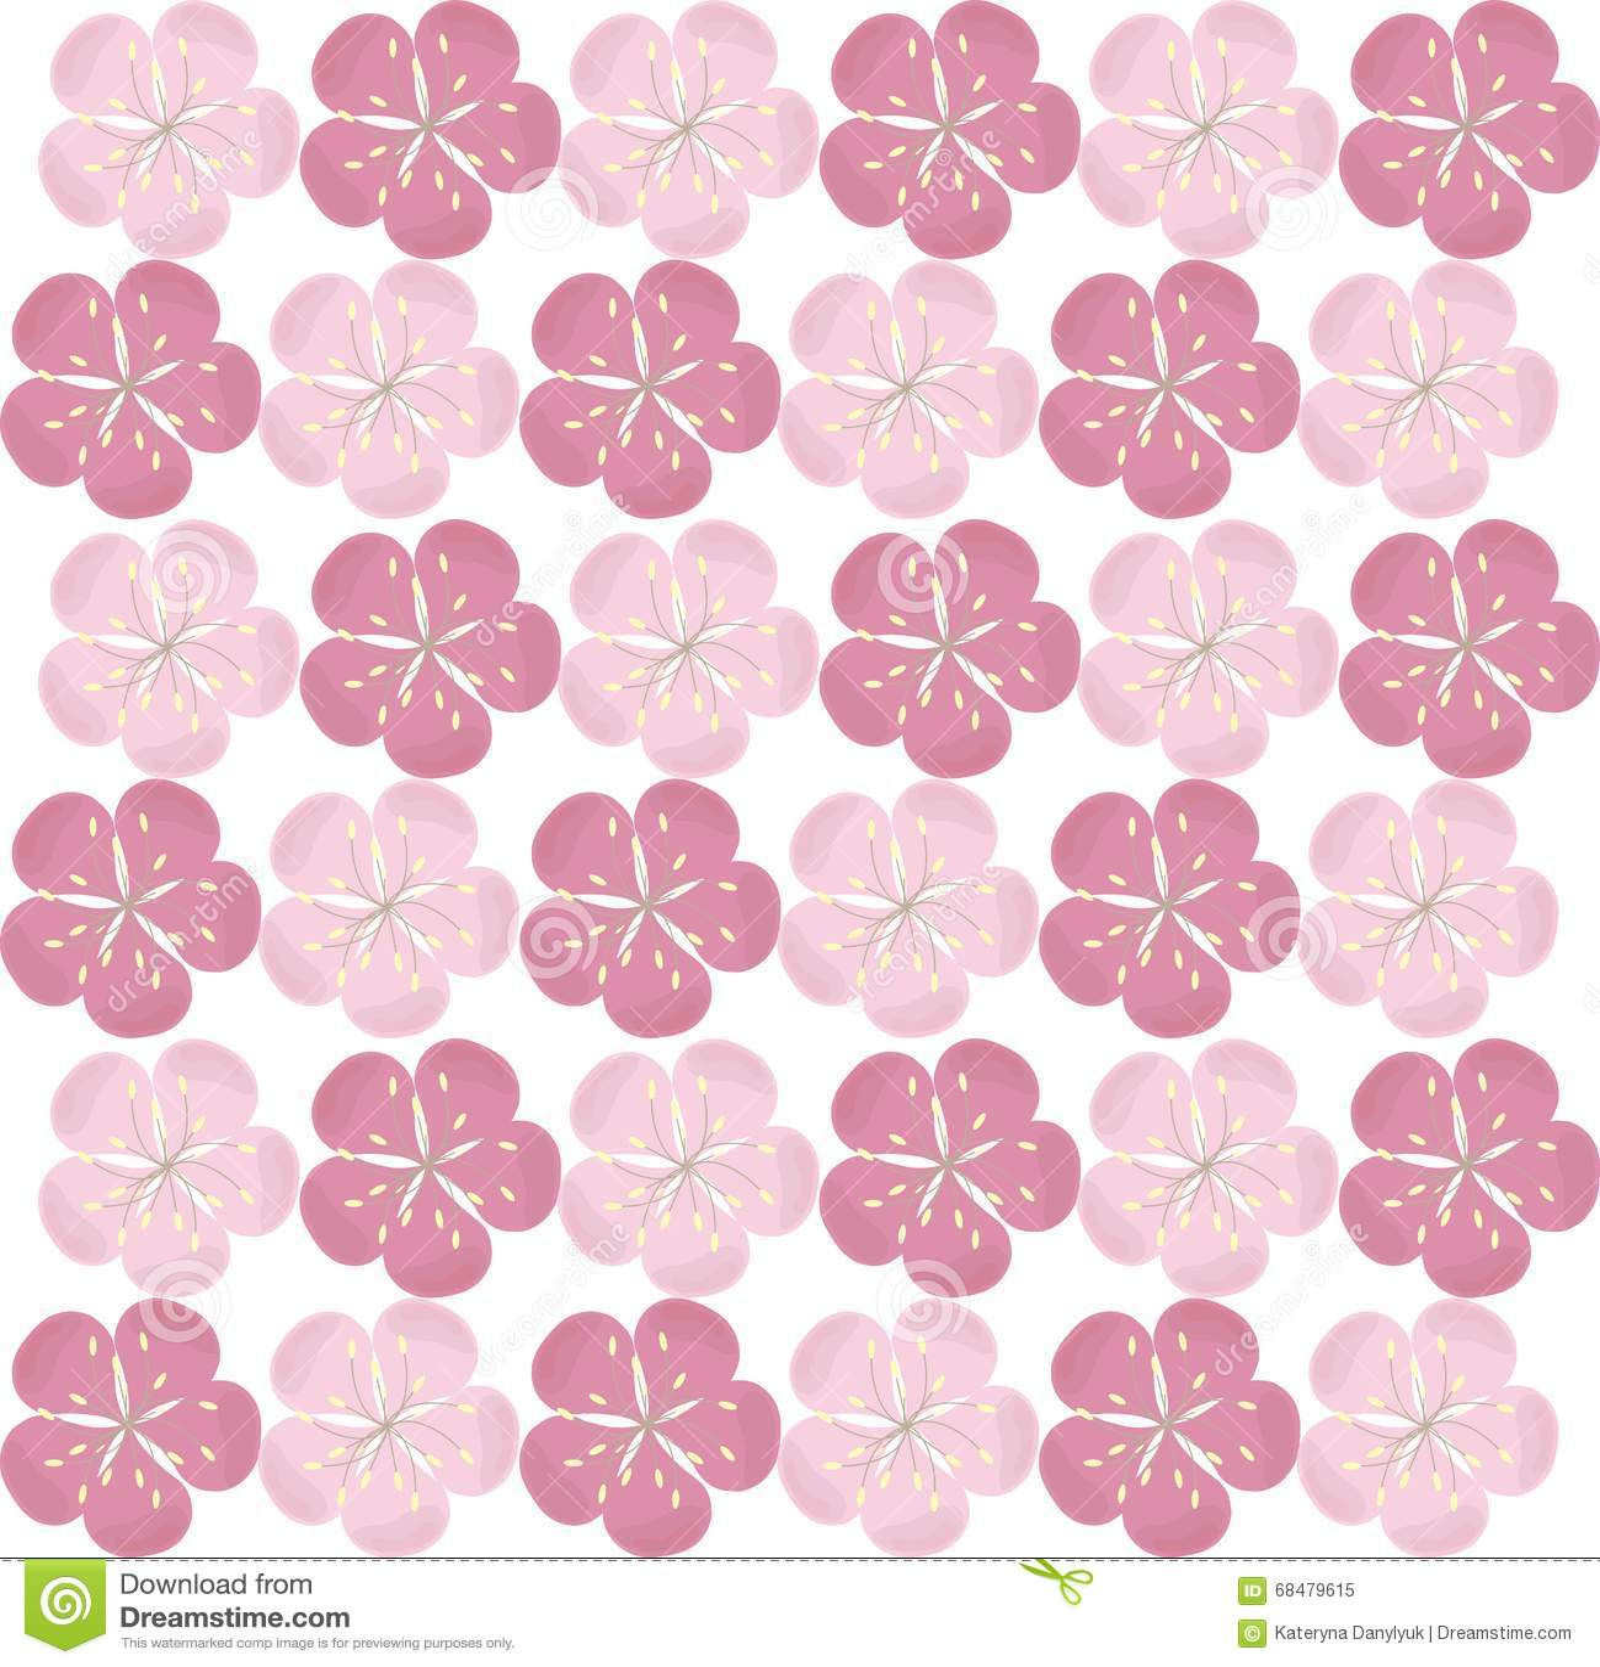 Seamless floral texture pink sakura flowers on white background background design element floral flowers packaging pink sakura dhlflorist Images